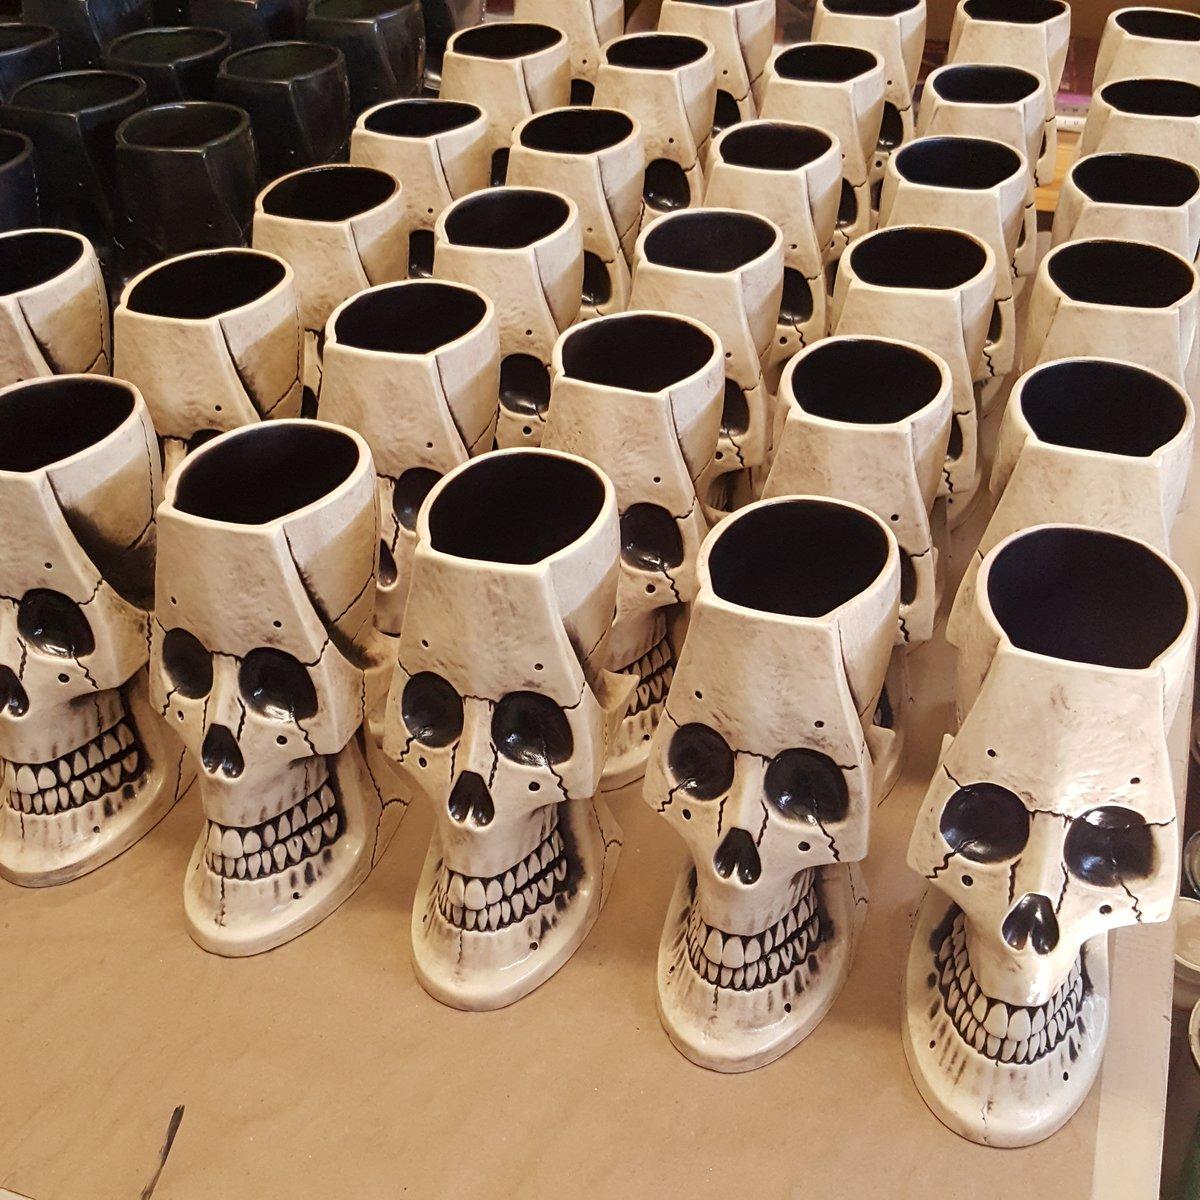 Image of Irwin the 2nd Skull Mug Limited Edition of 100 Bone